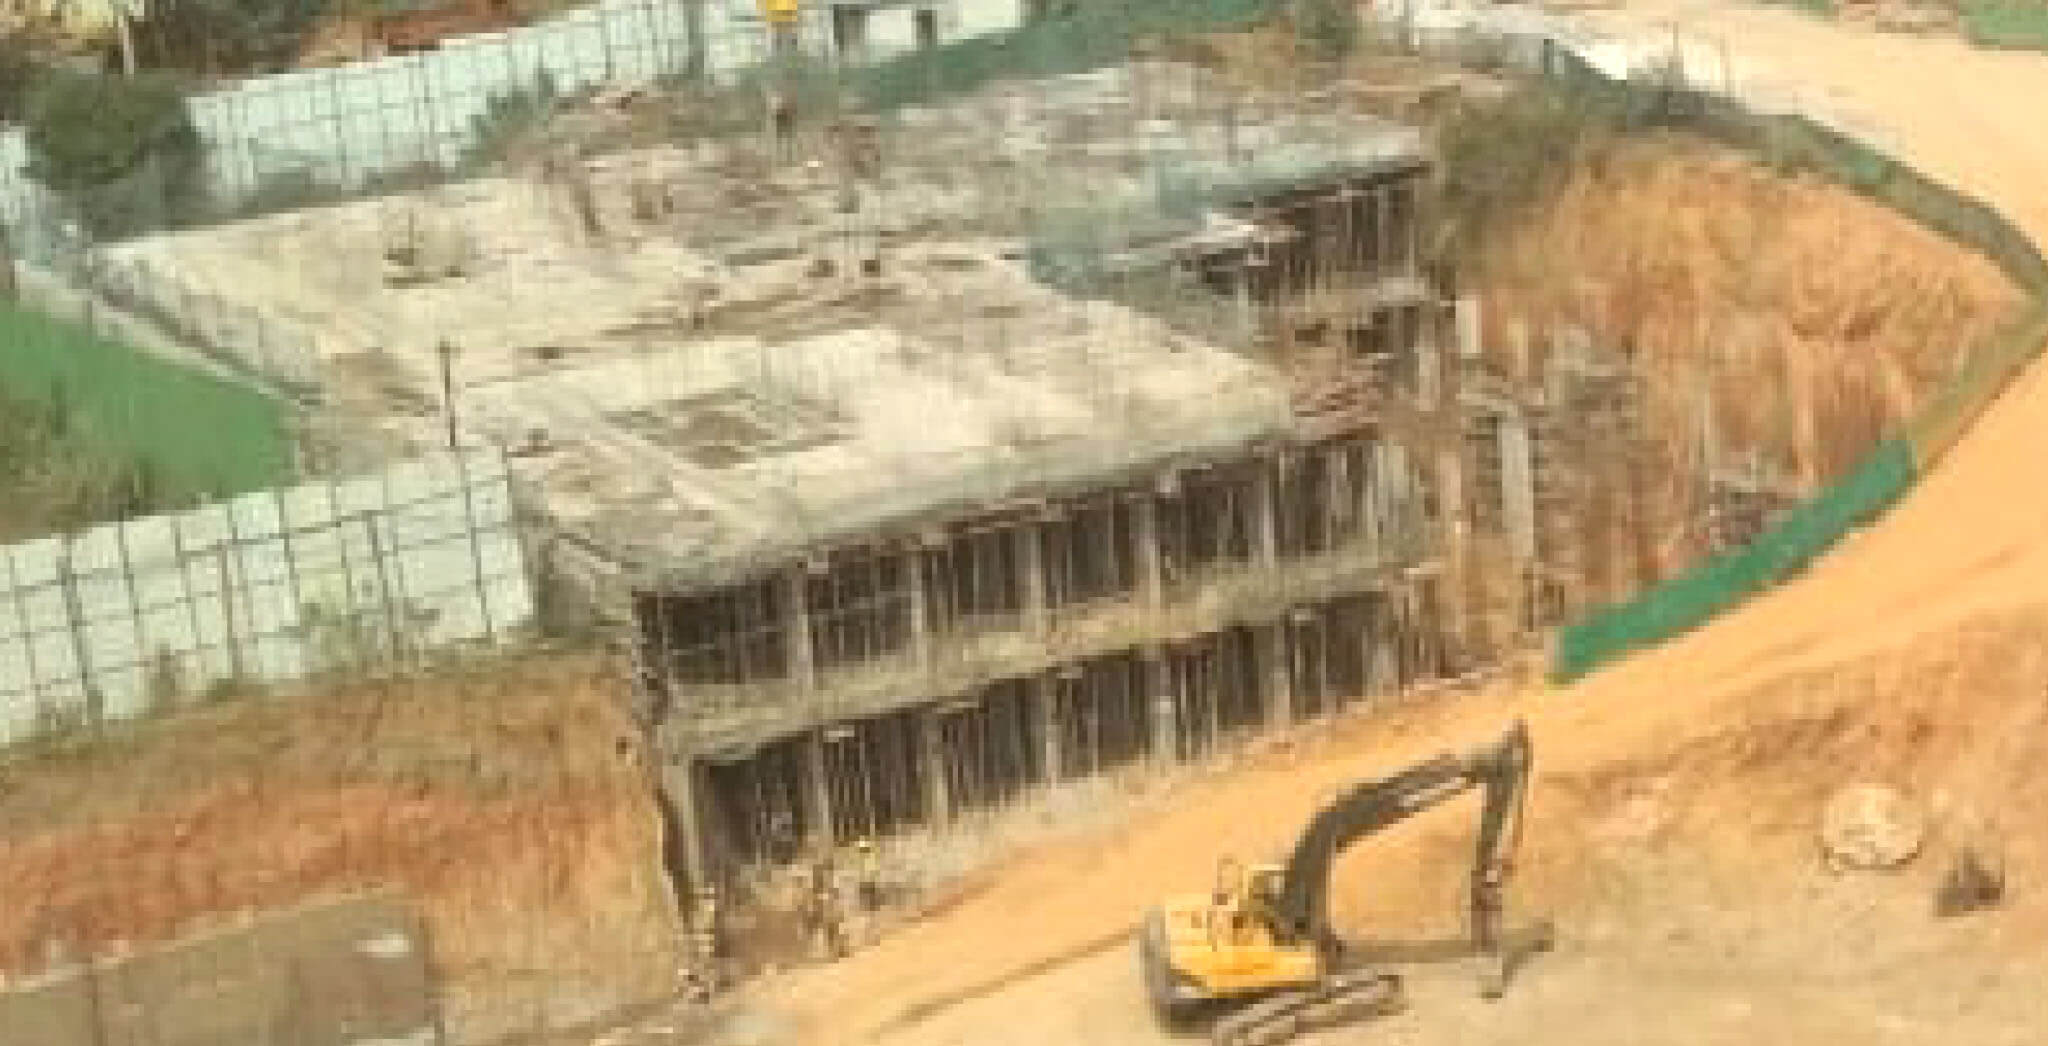 Jan 2020 - A & B Blocks: Ground floor work-in-progress